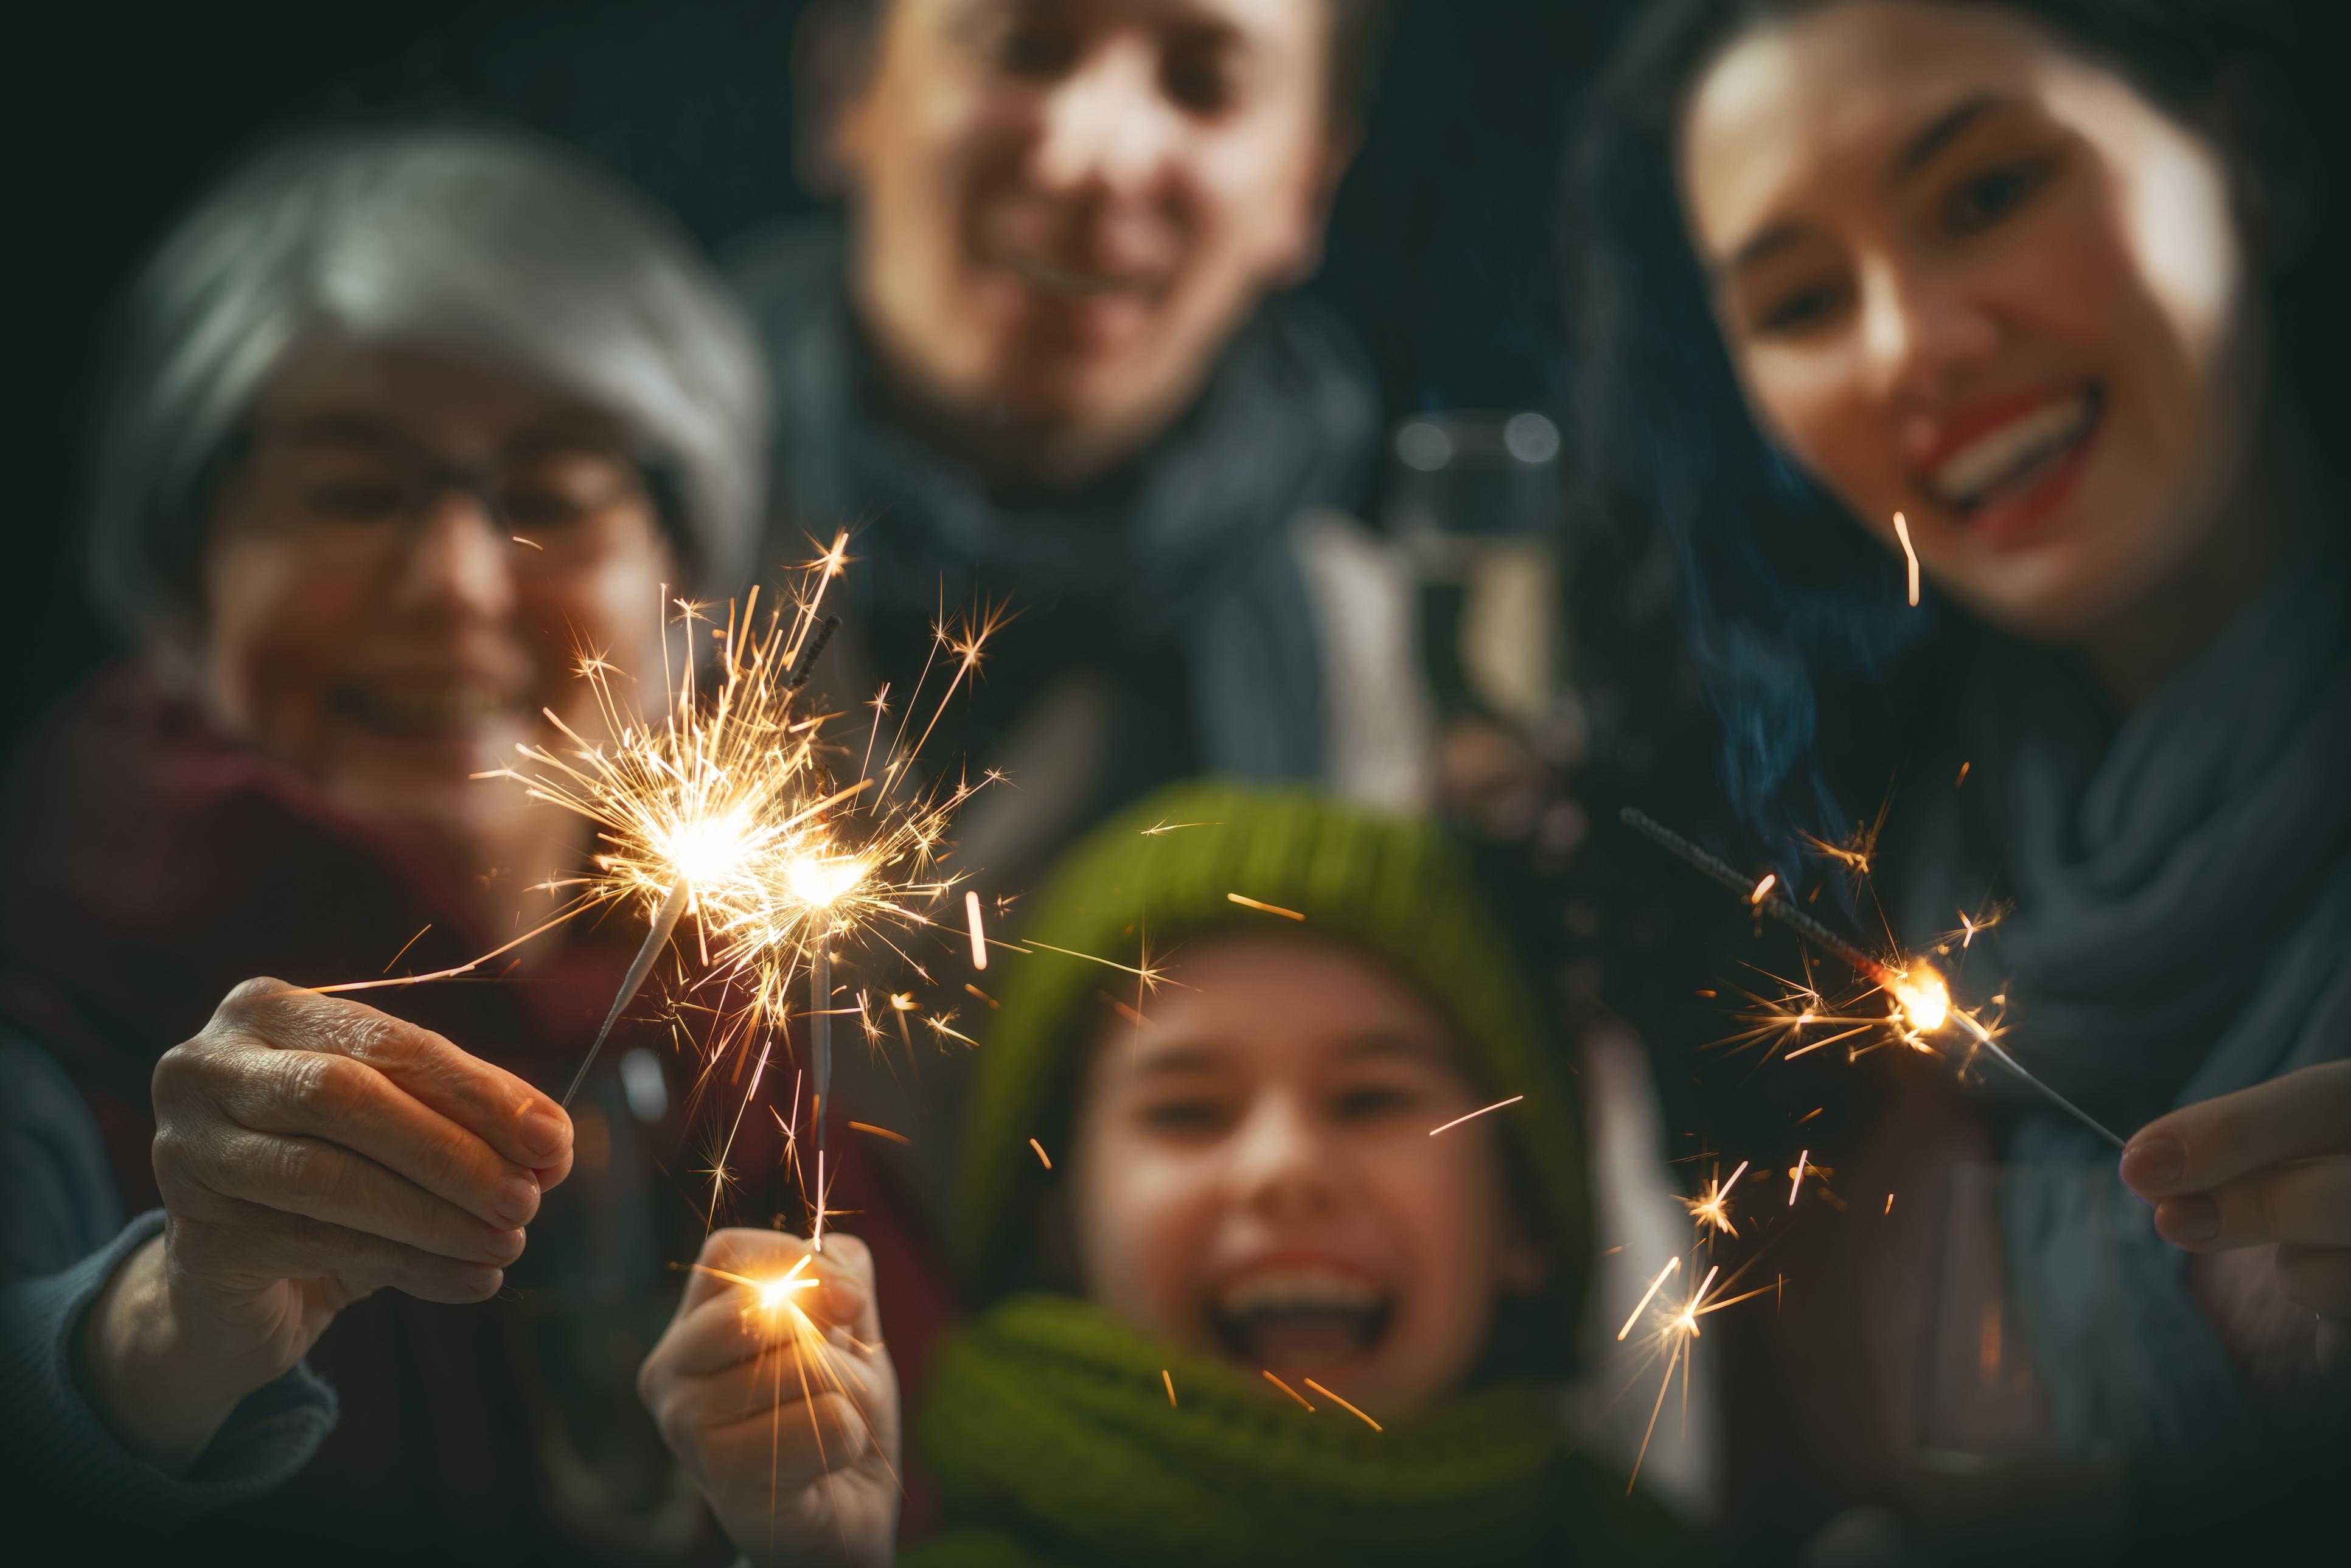 Family having fun, holding sparklers.